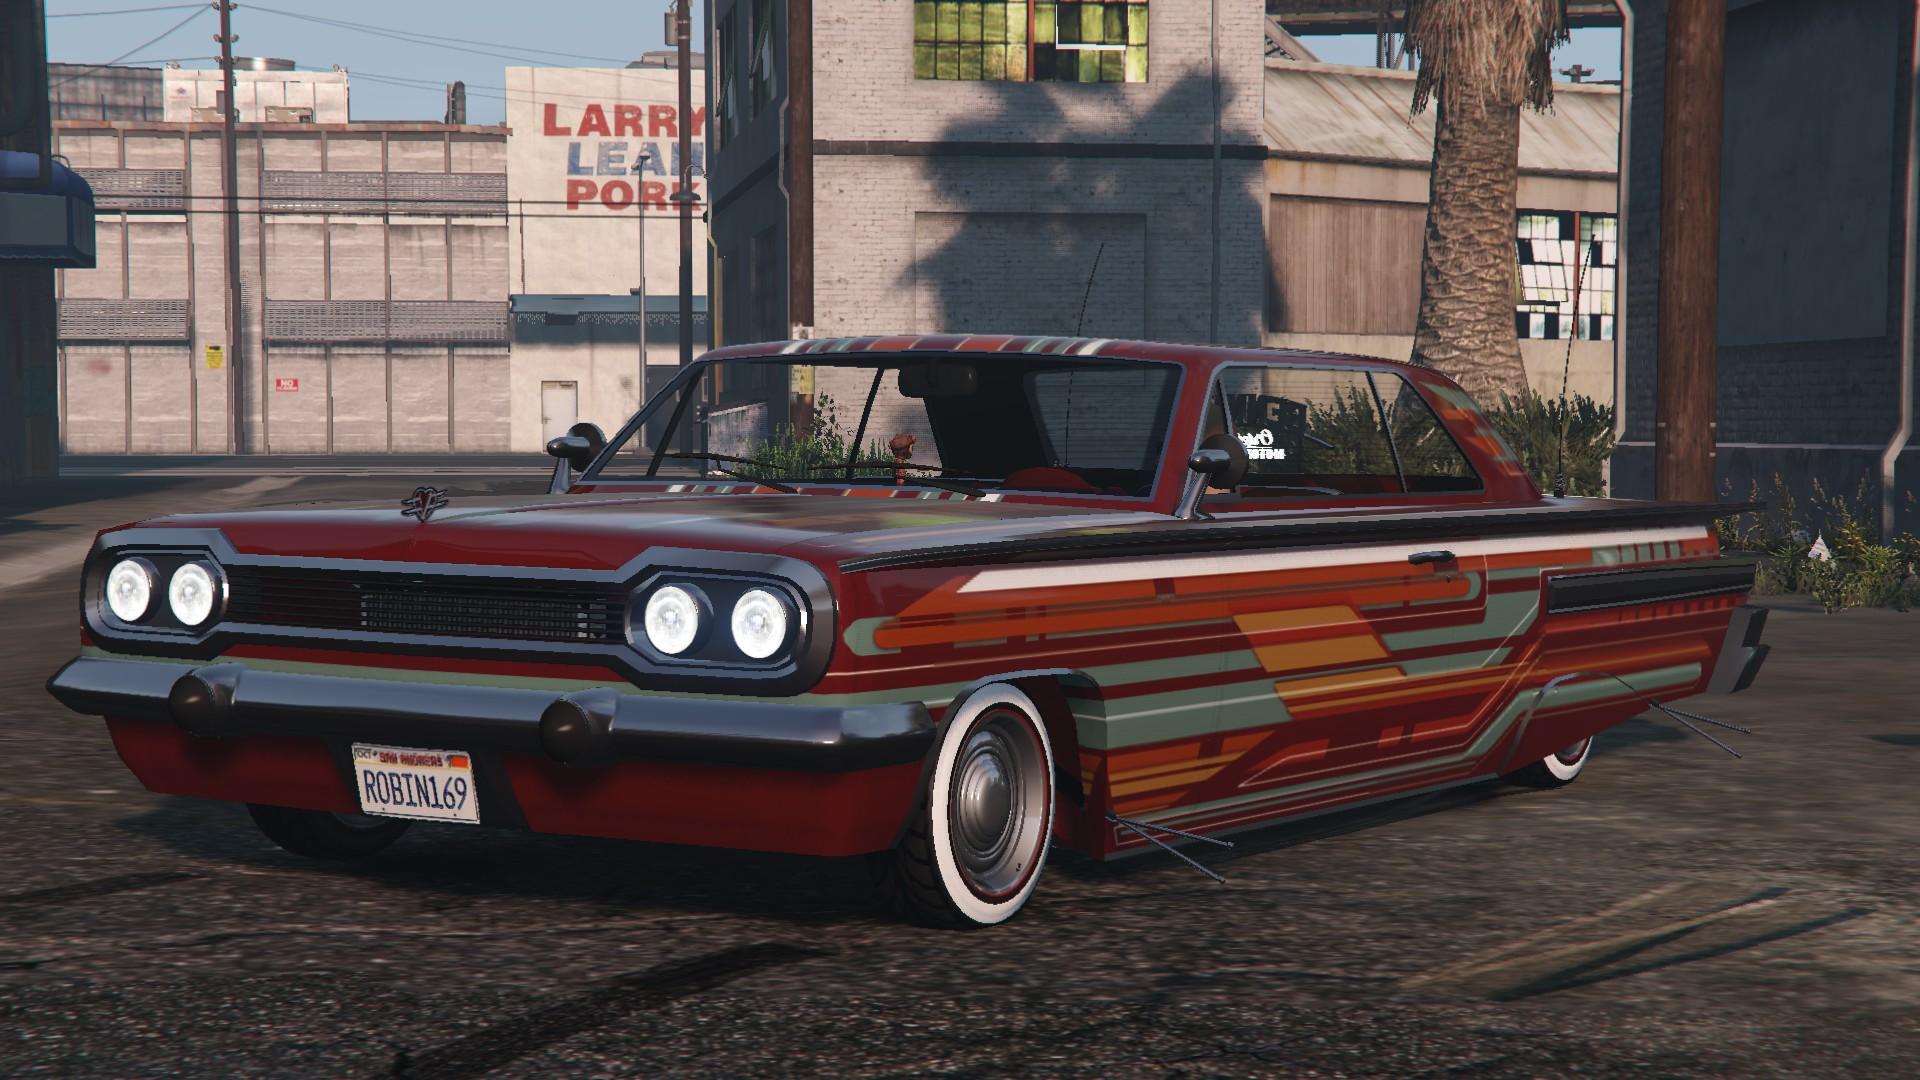 Grand Theft Auto Fan Art favourites by francisjairam121 on ...  Grand Theft Aut...